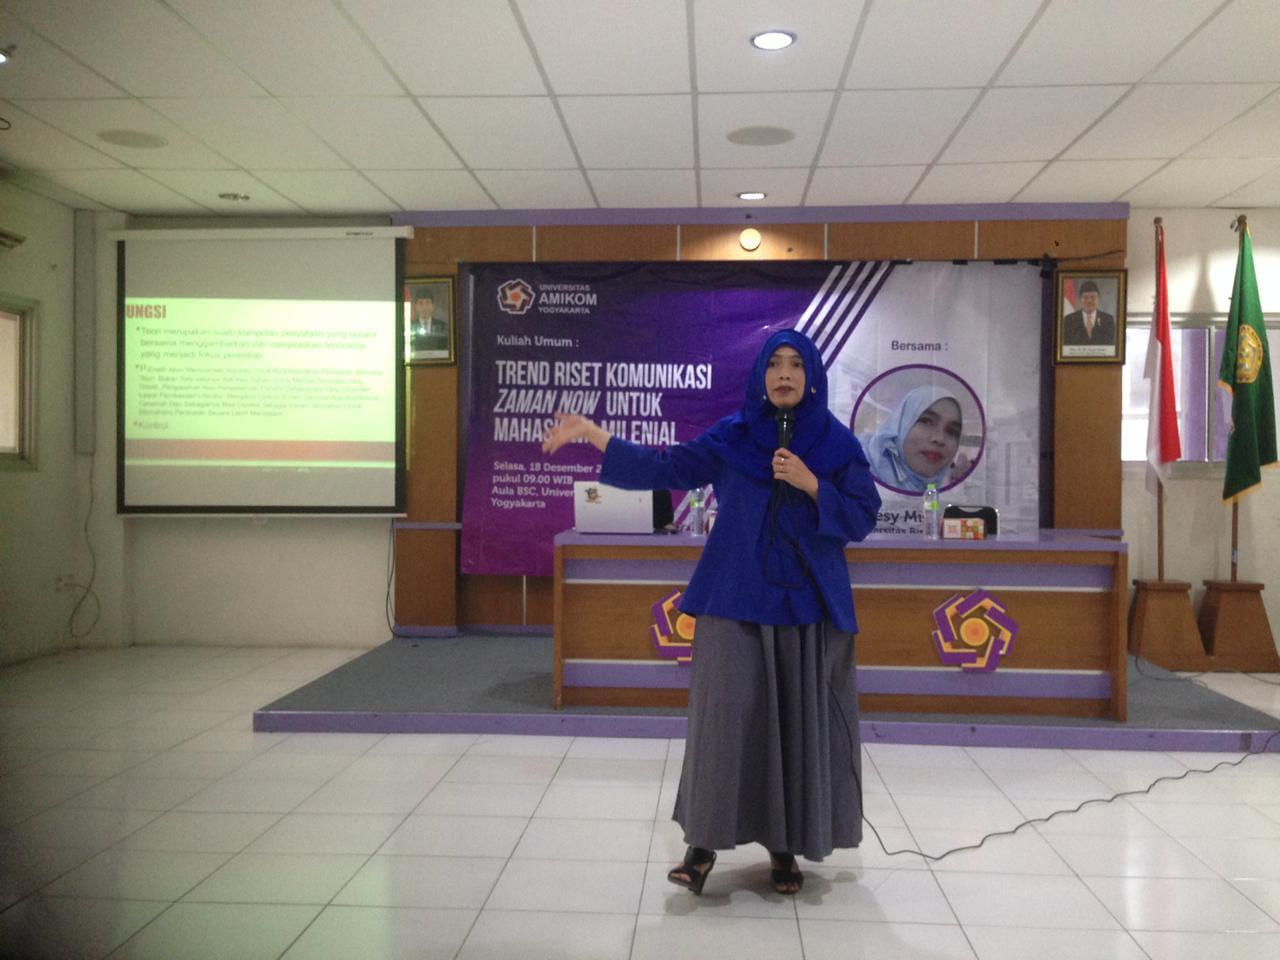 Ibu Dr. Desy Misnawati M.Ikom, Dosen Ilmu Komunikasi Menjadi Pembicara di Kuliah Umum Universitas Amikom Yogjakarya